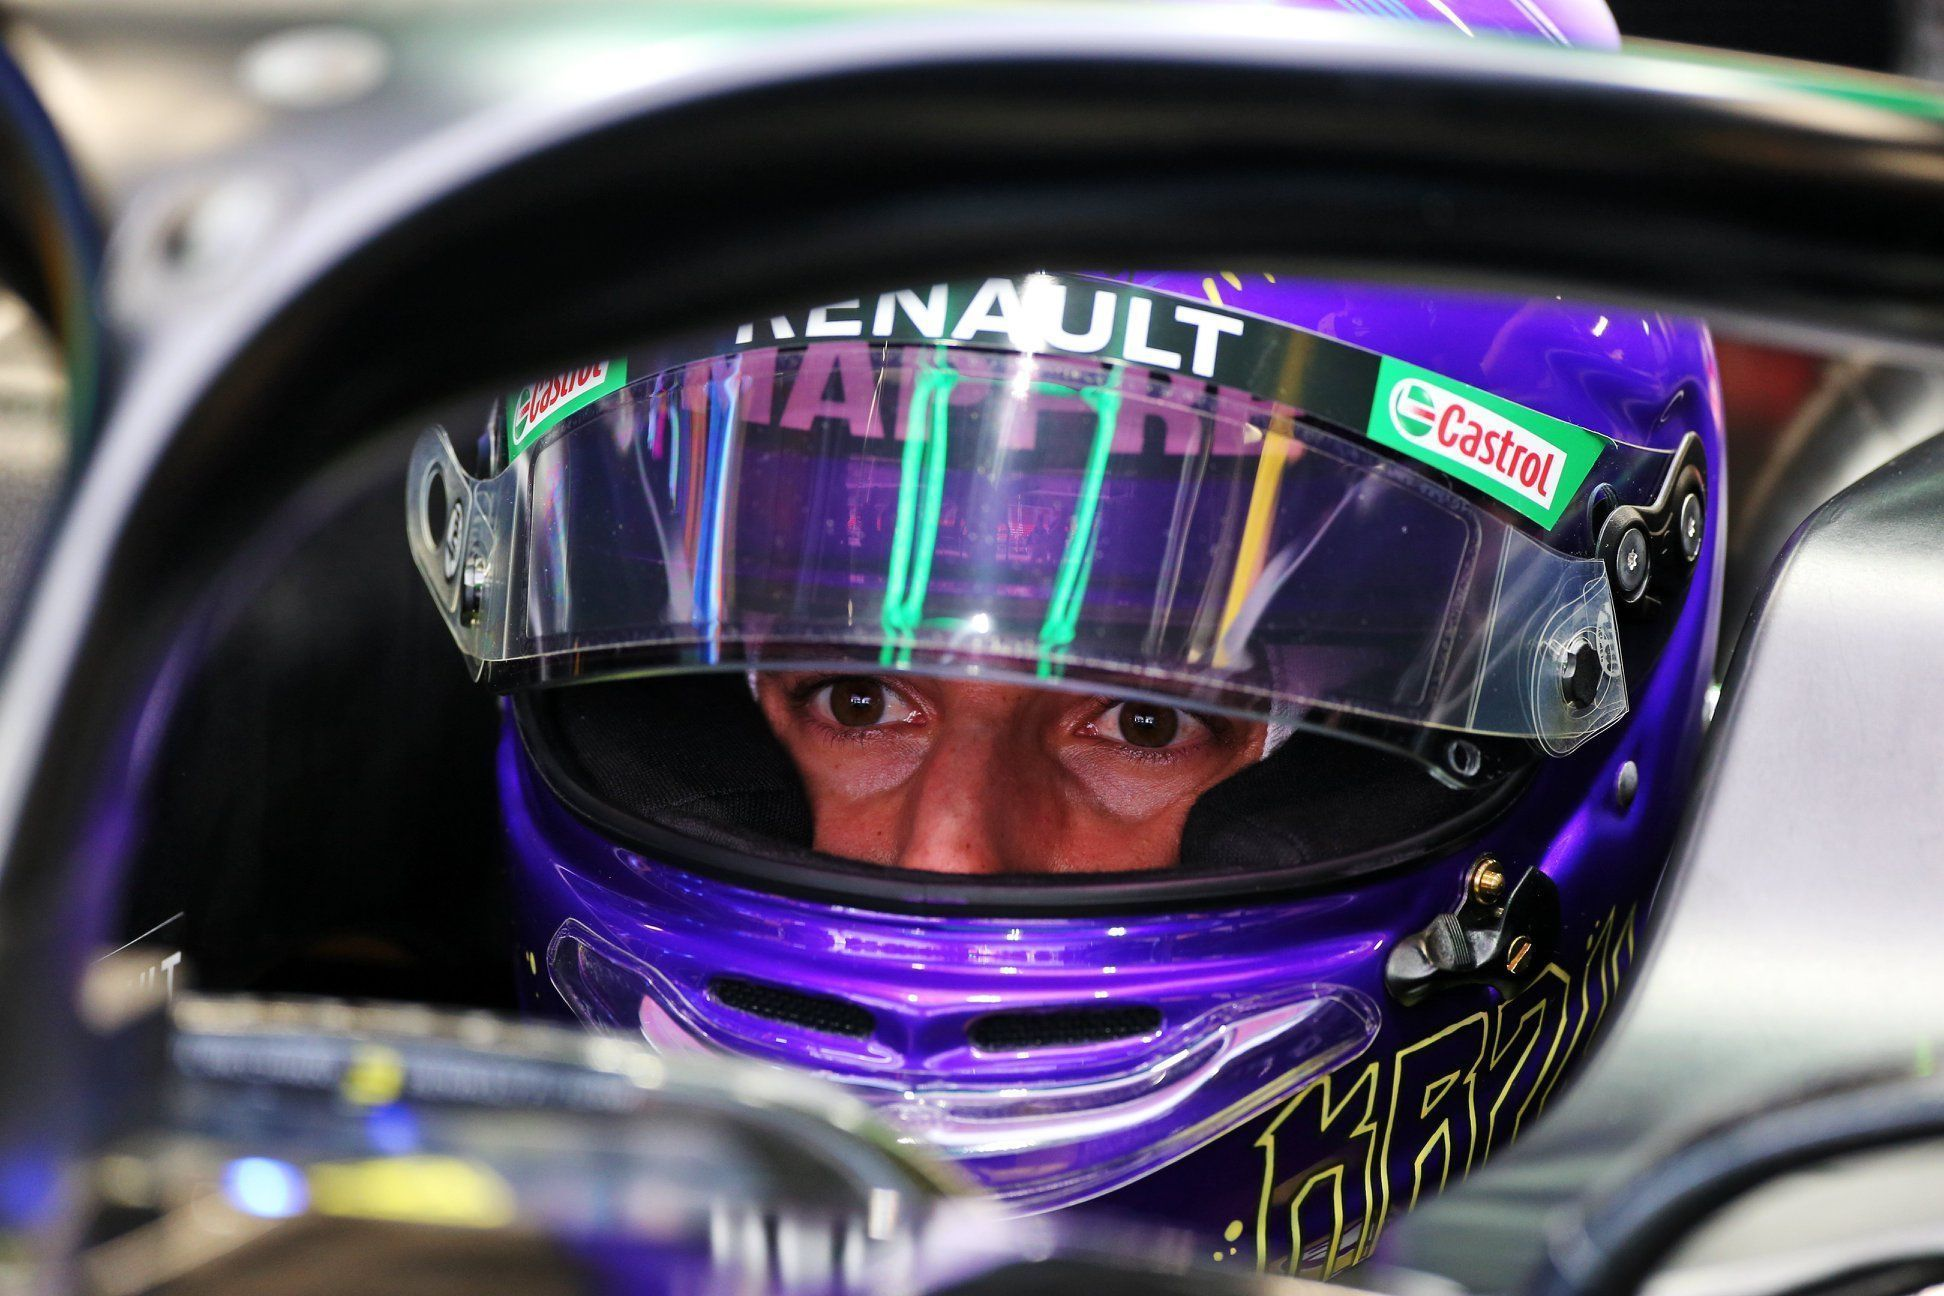 Cyril Abiteboul, Daniel Ricciardo, Carlos Sainz